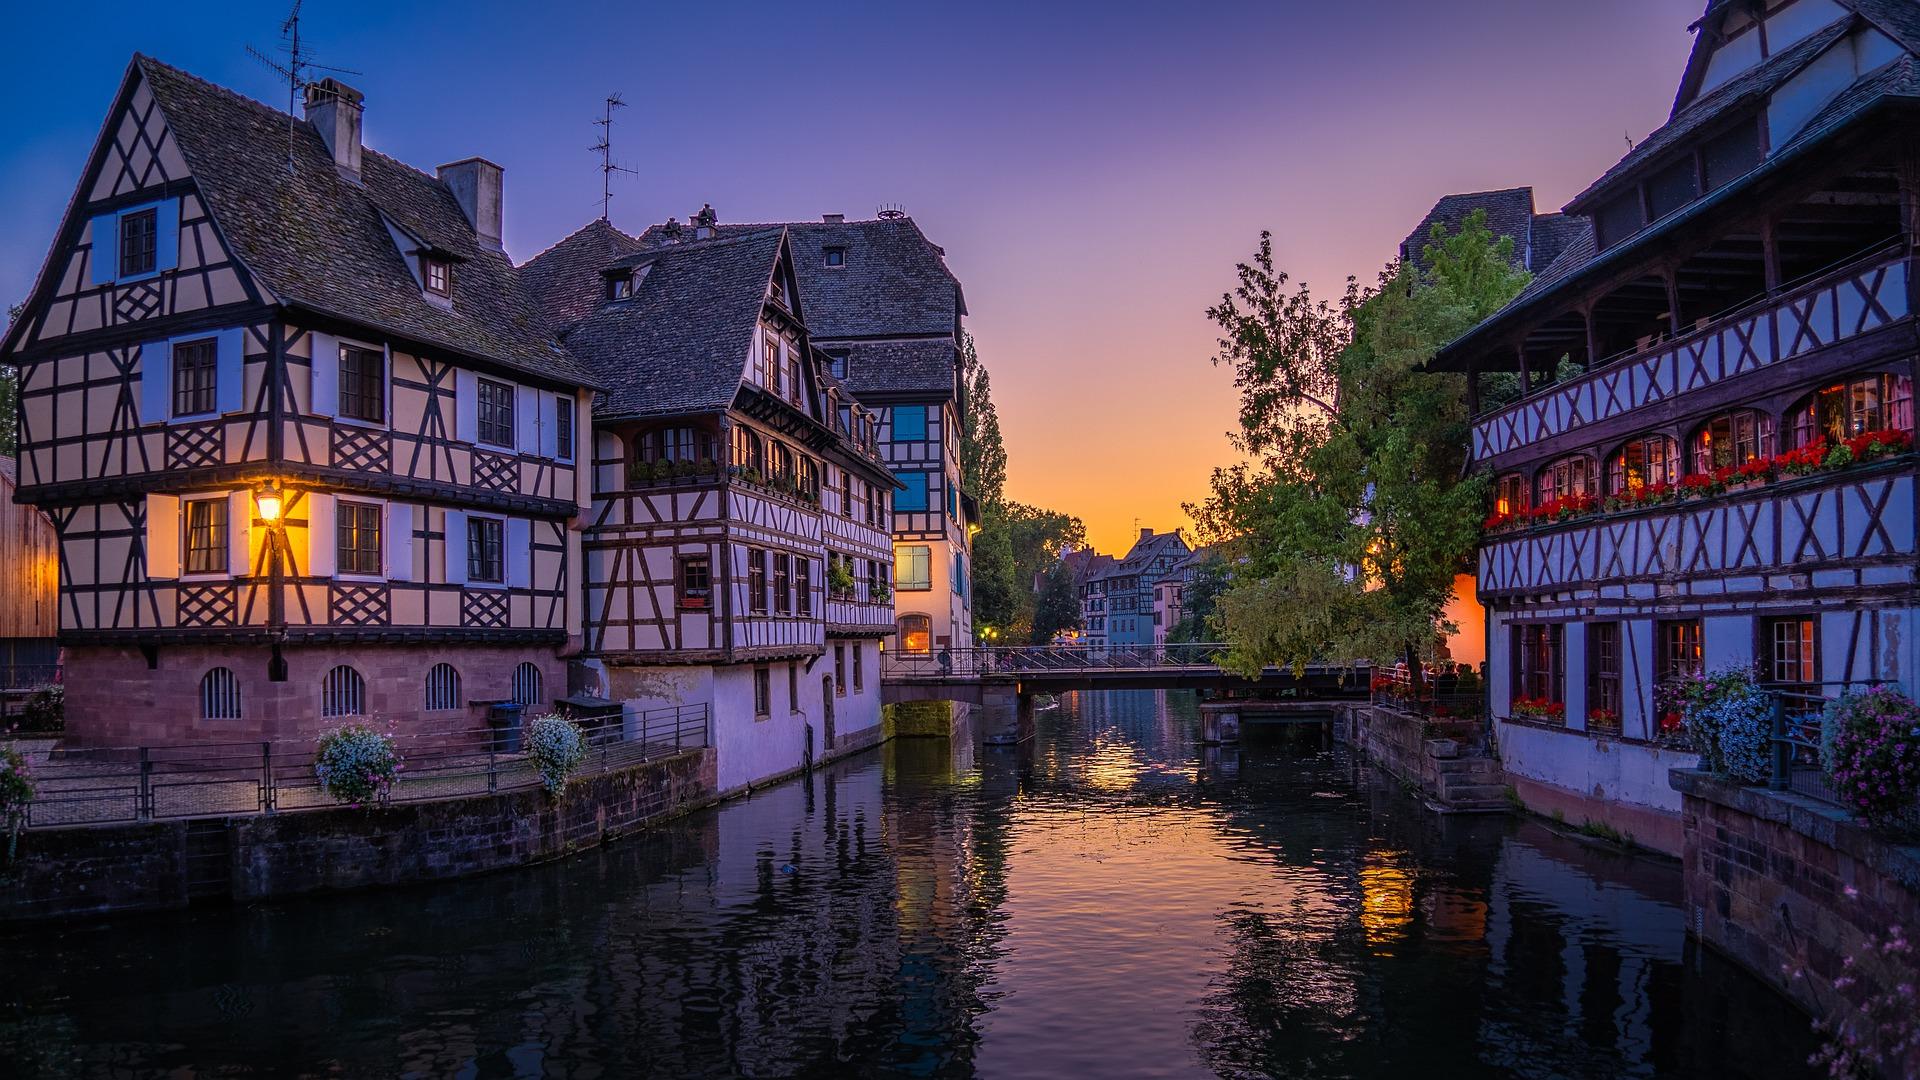 Day 7. Strasbourg – Hometown